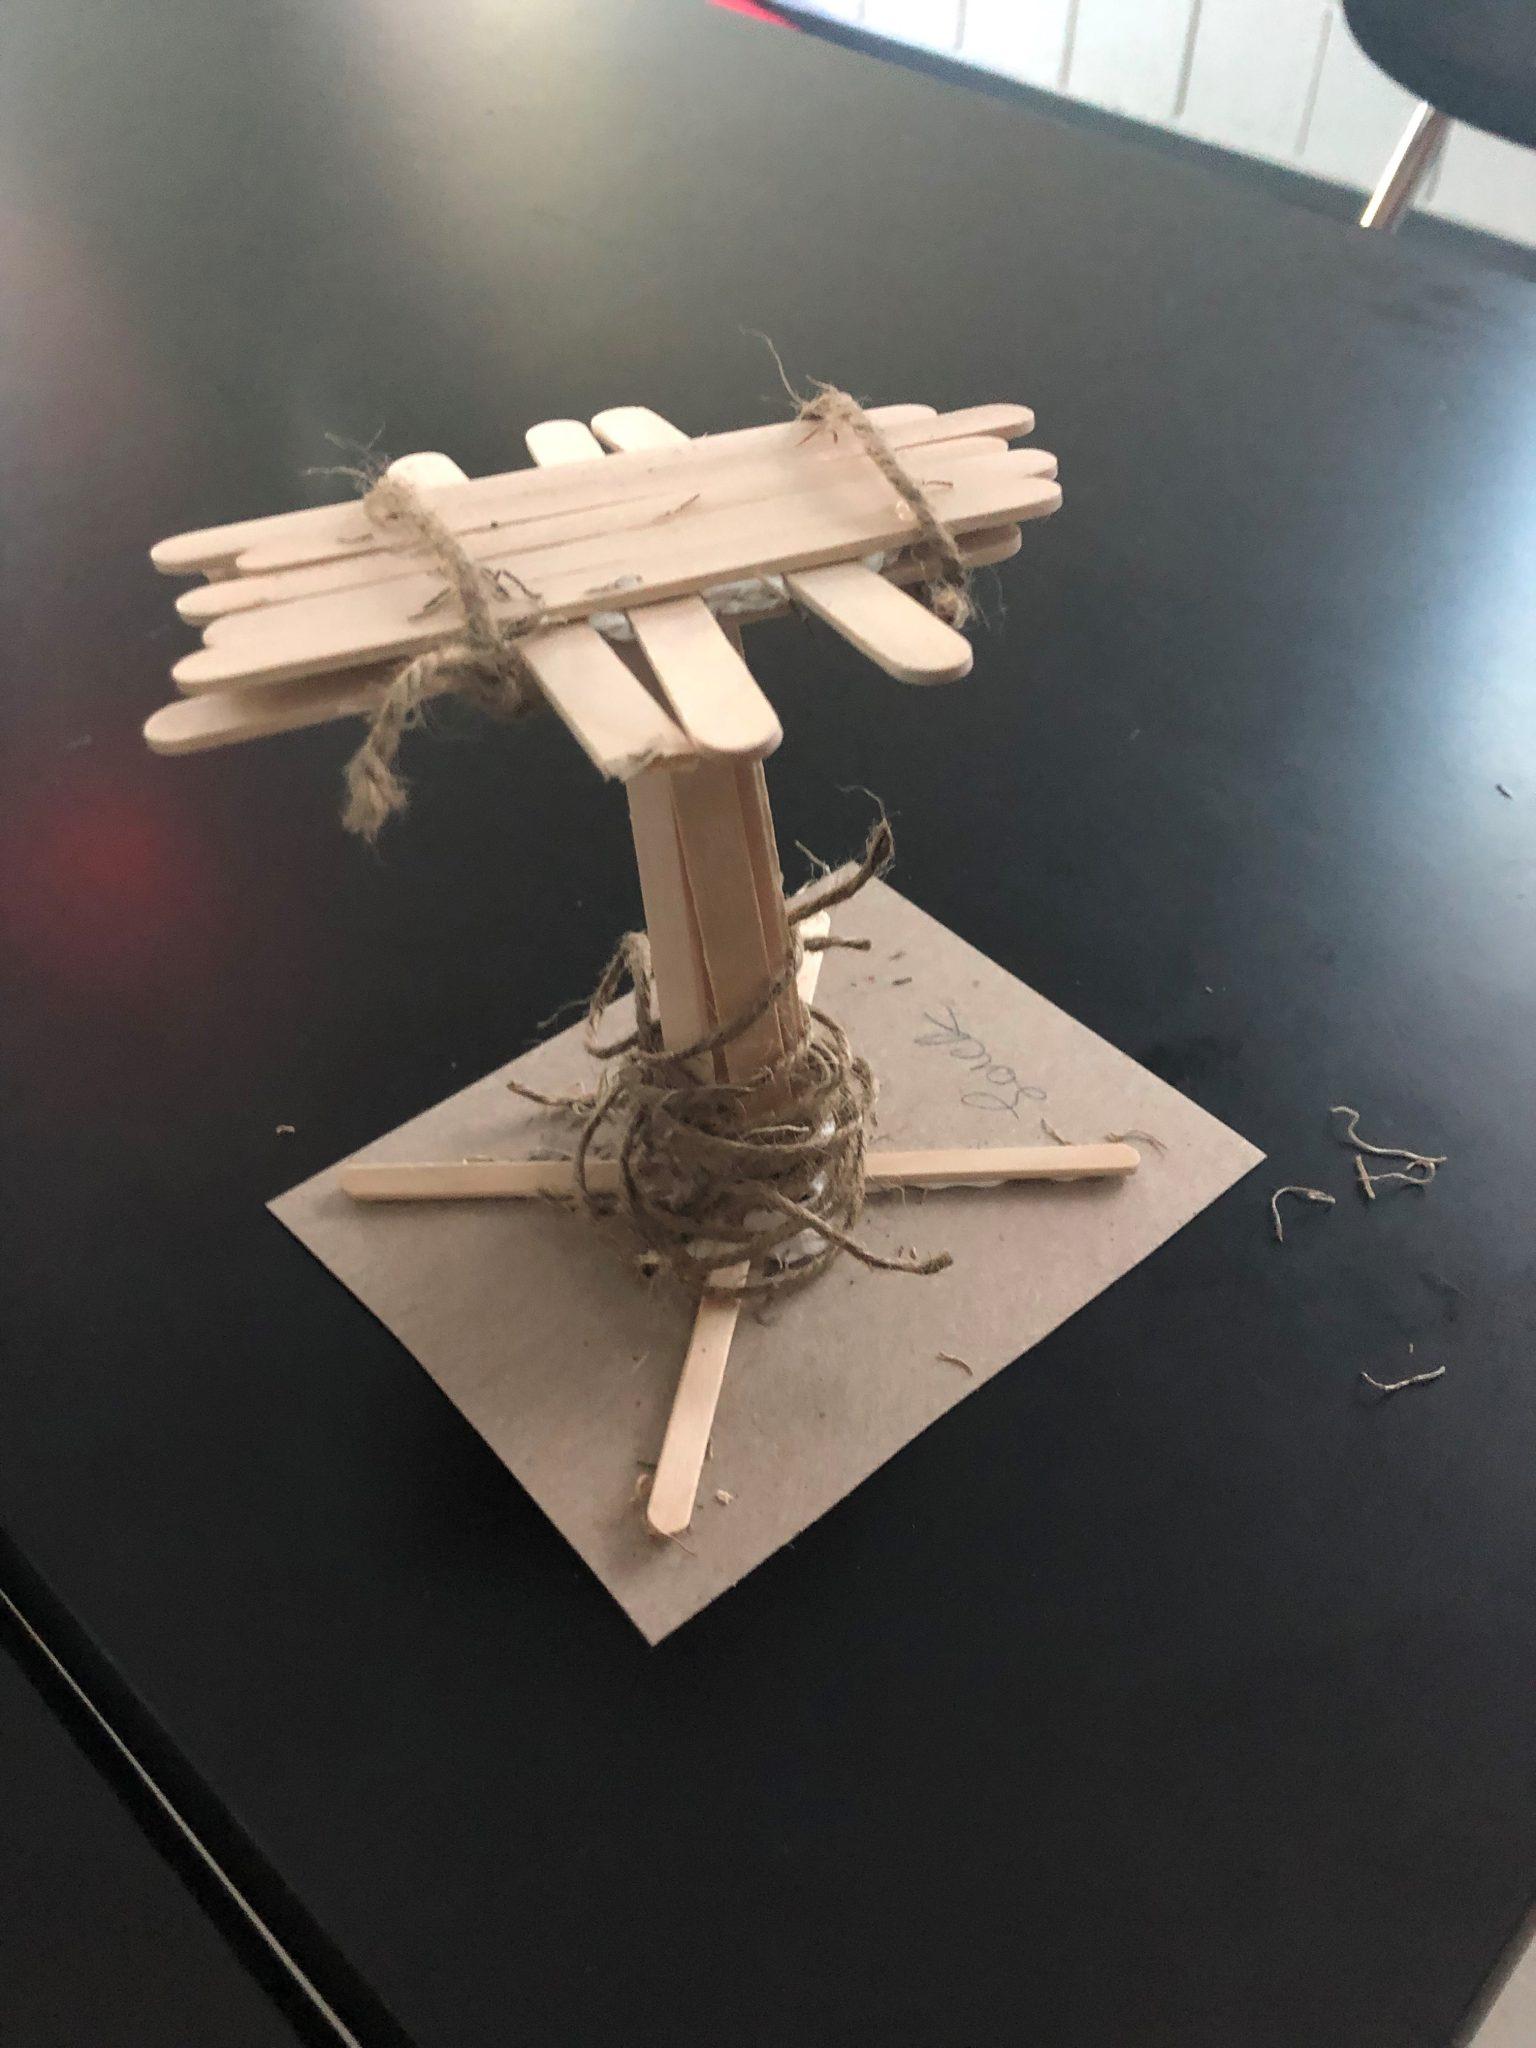 osprey nest final outcome 2